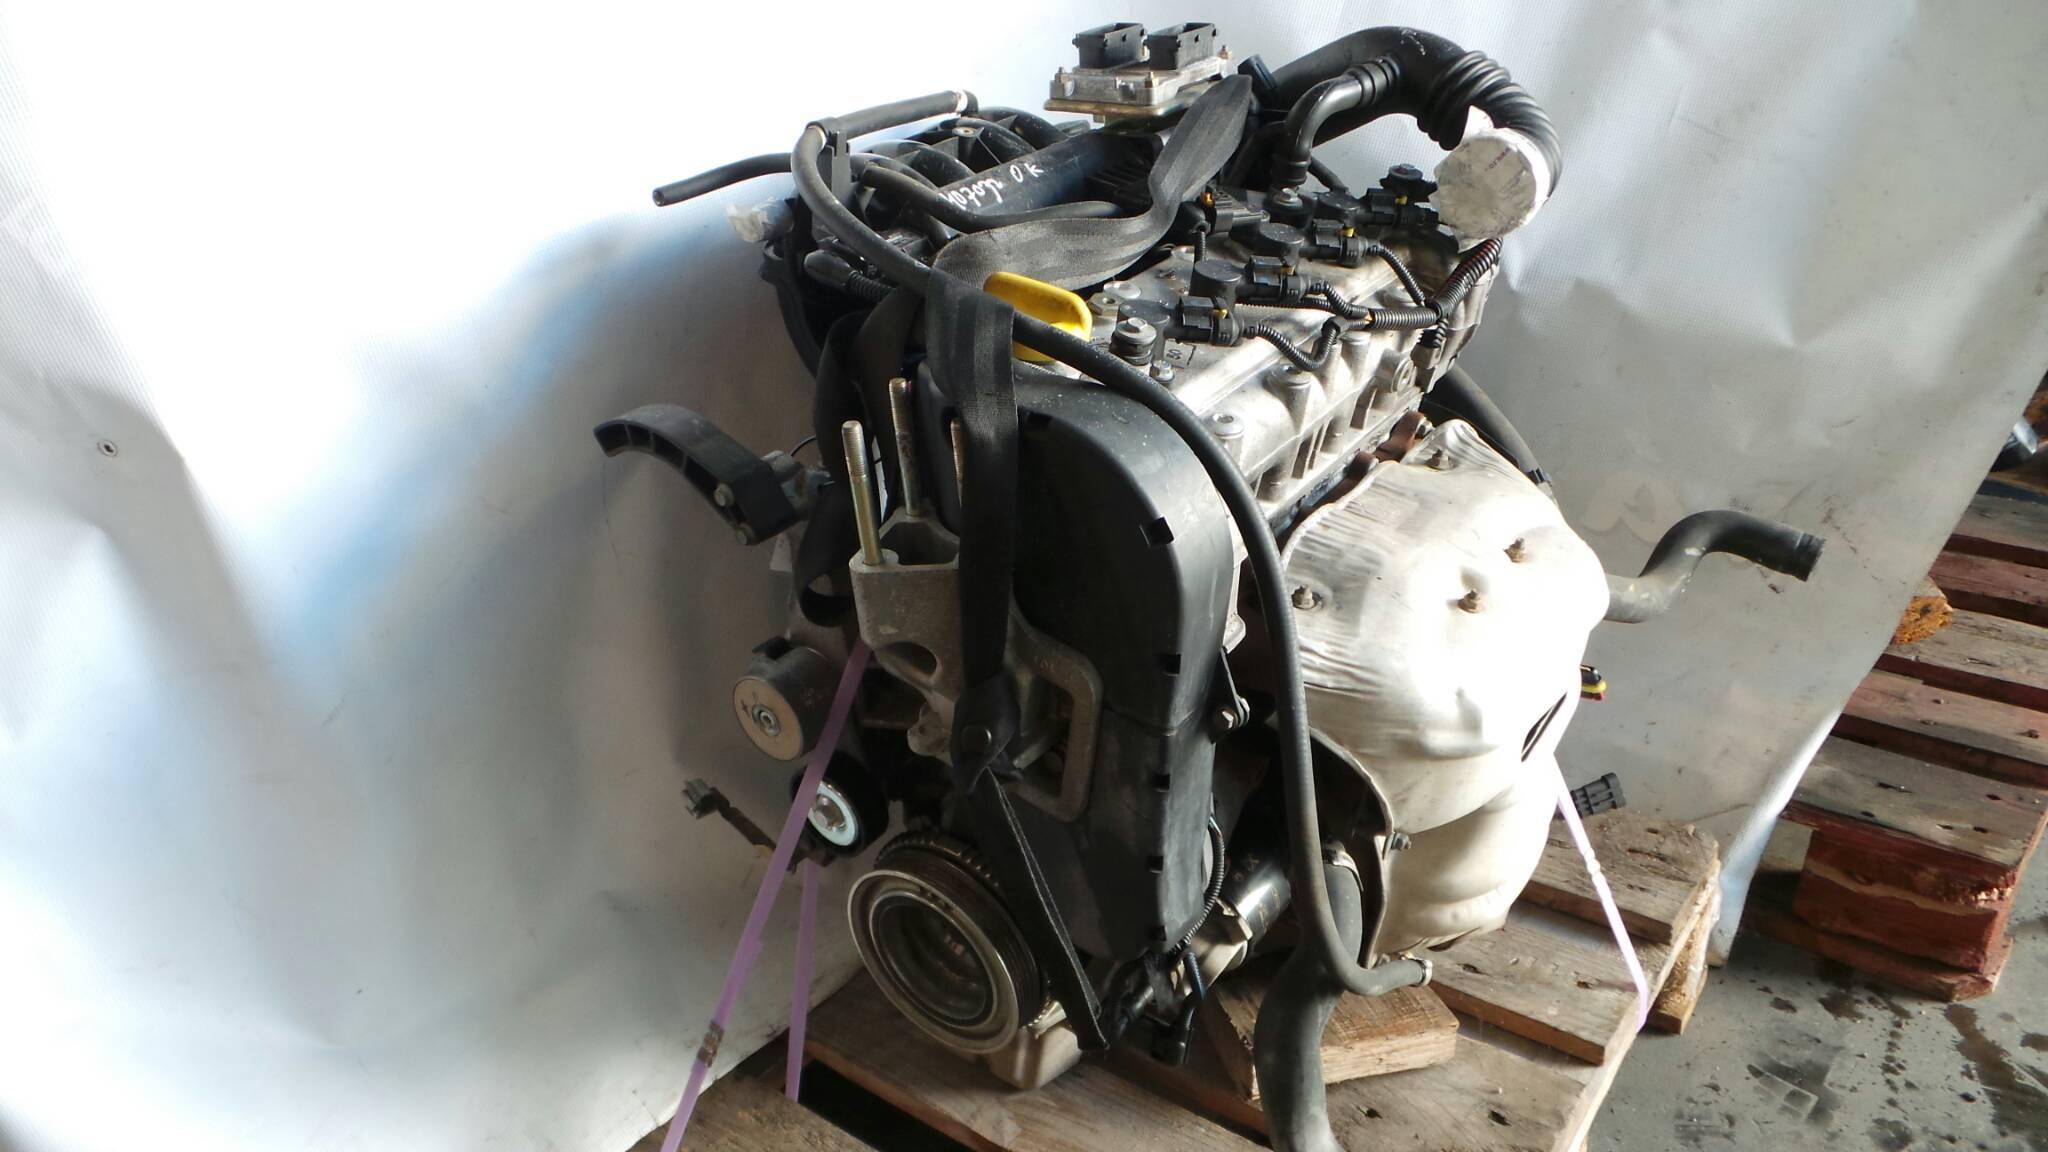 Engine Fiat Idea 350 14 16v 10446 Fuse Box Complete 1002368 95hp 843 A1